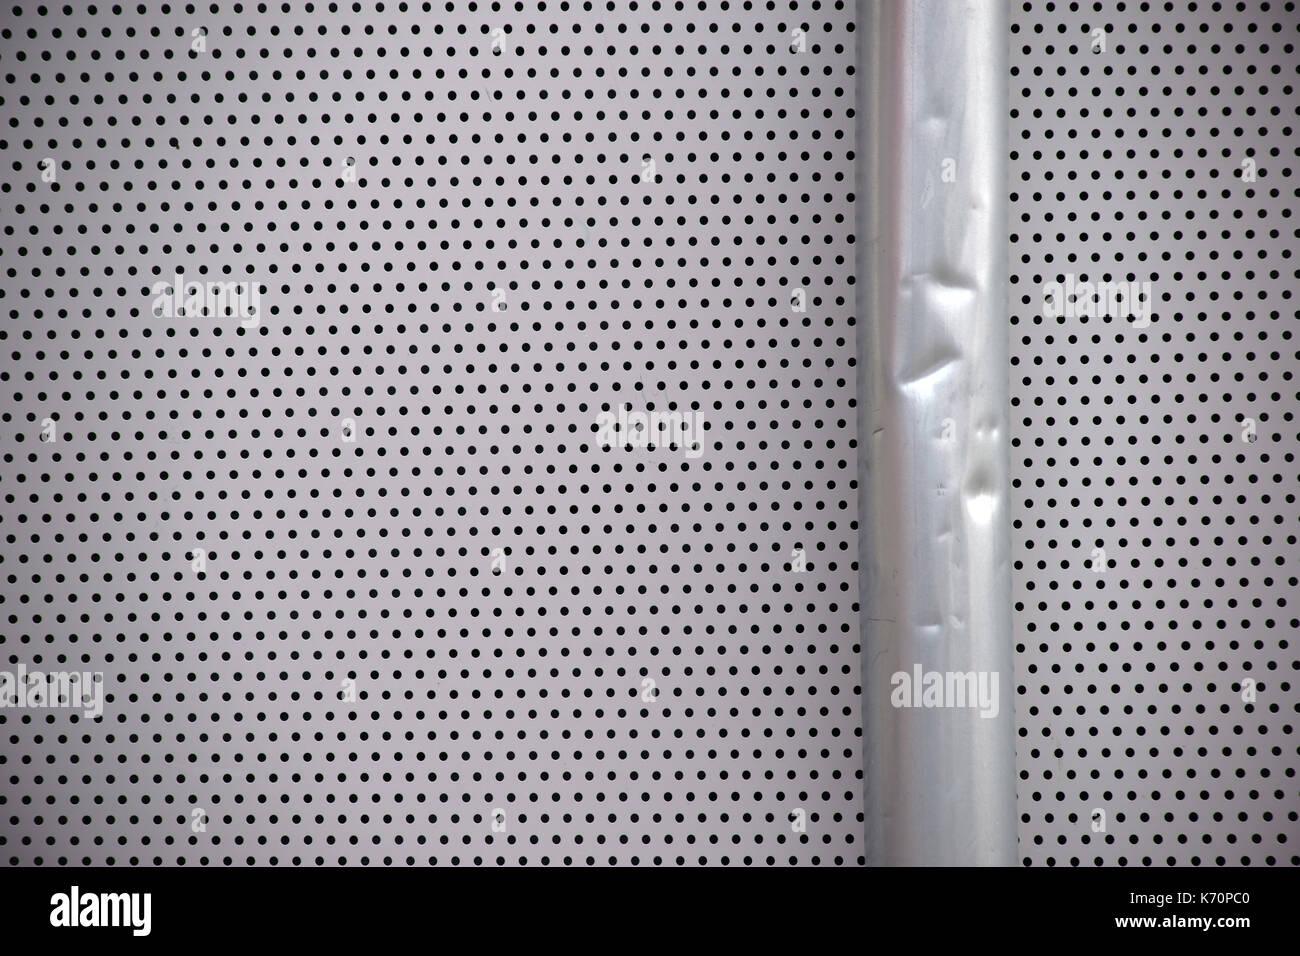 Riser Pipe Stock Photos Amp Riser Pipe Stock Images Alamy